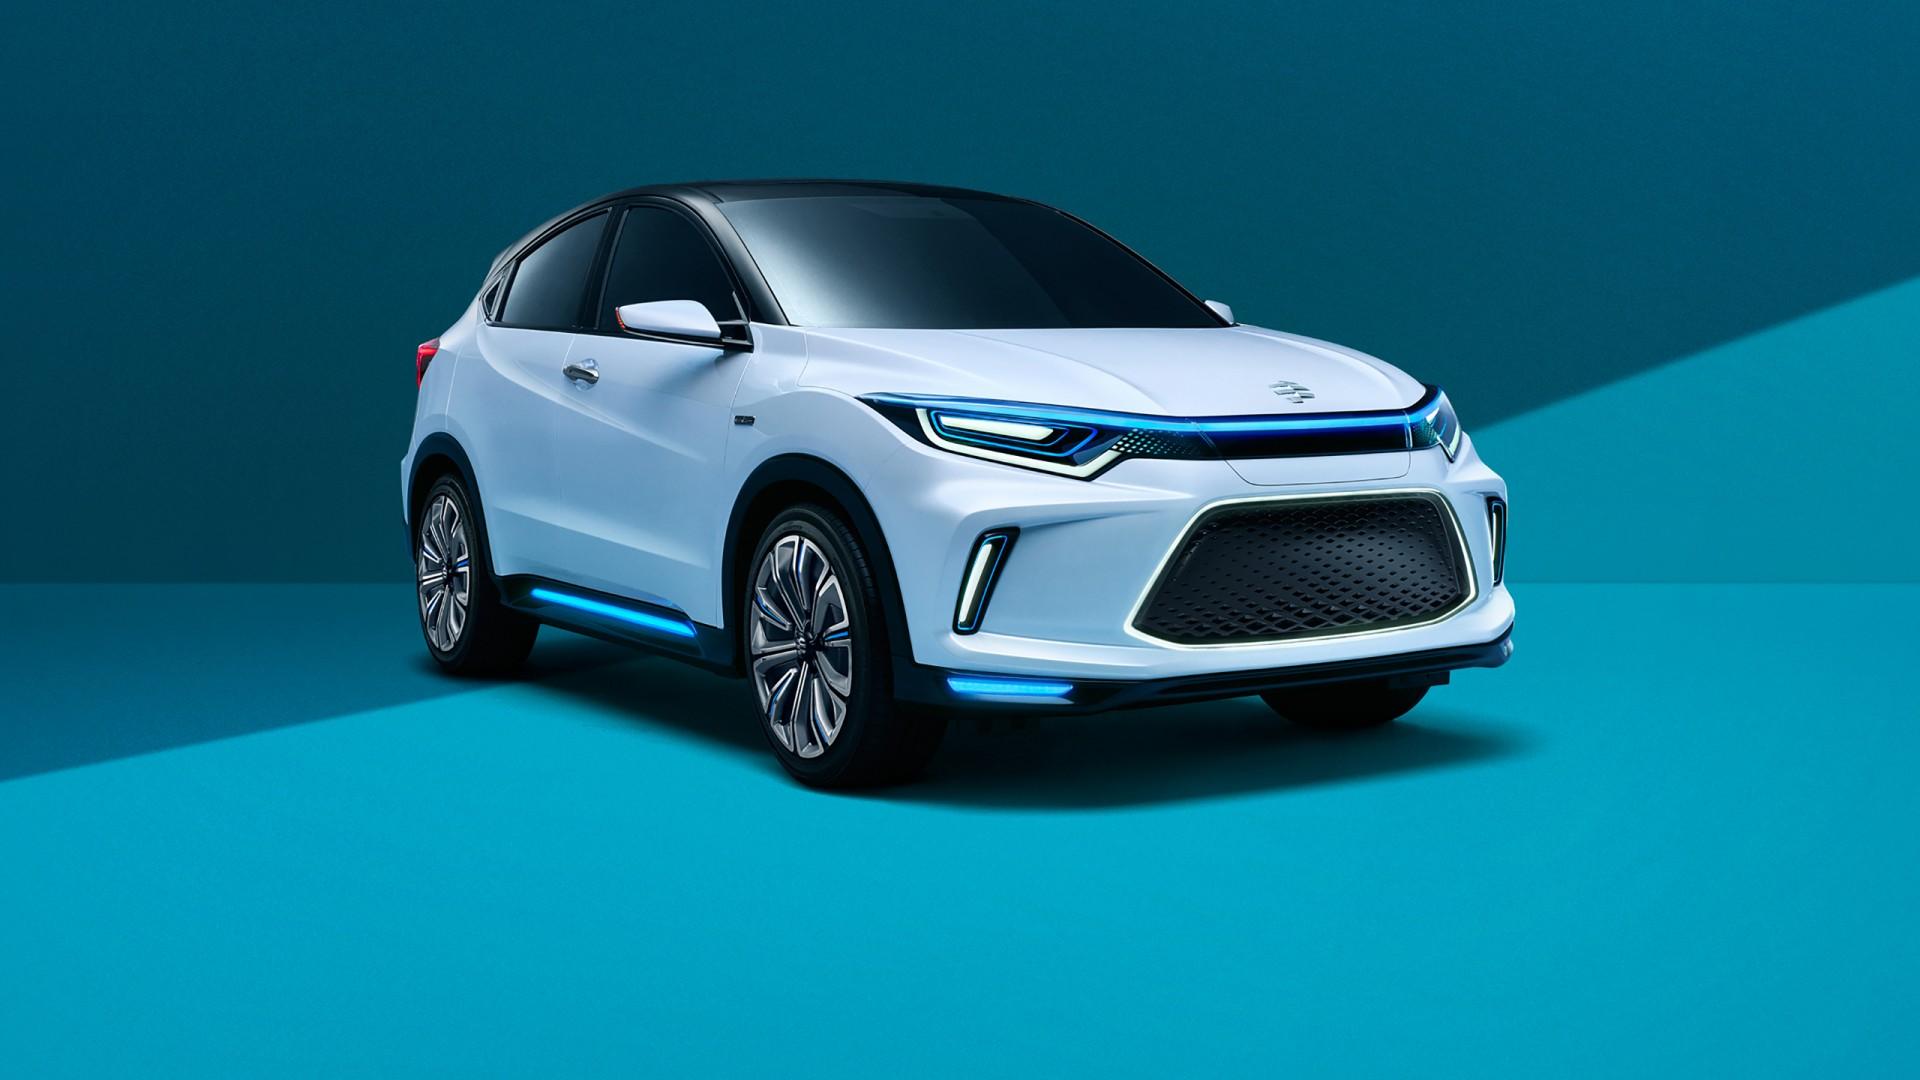 Desktop Sports Car Wallpapers 2018 Honda Everus Ev Concept Wallpaper Hd Car Wallpapers